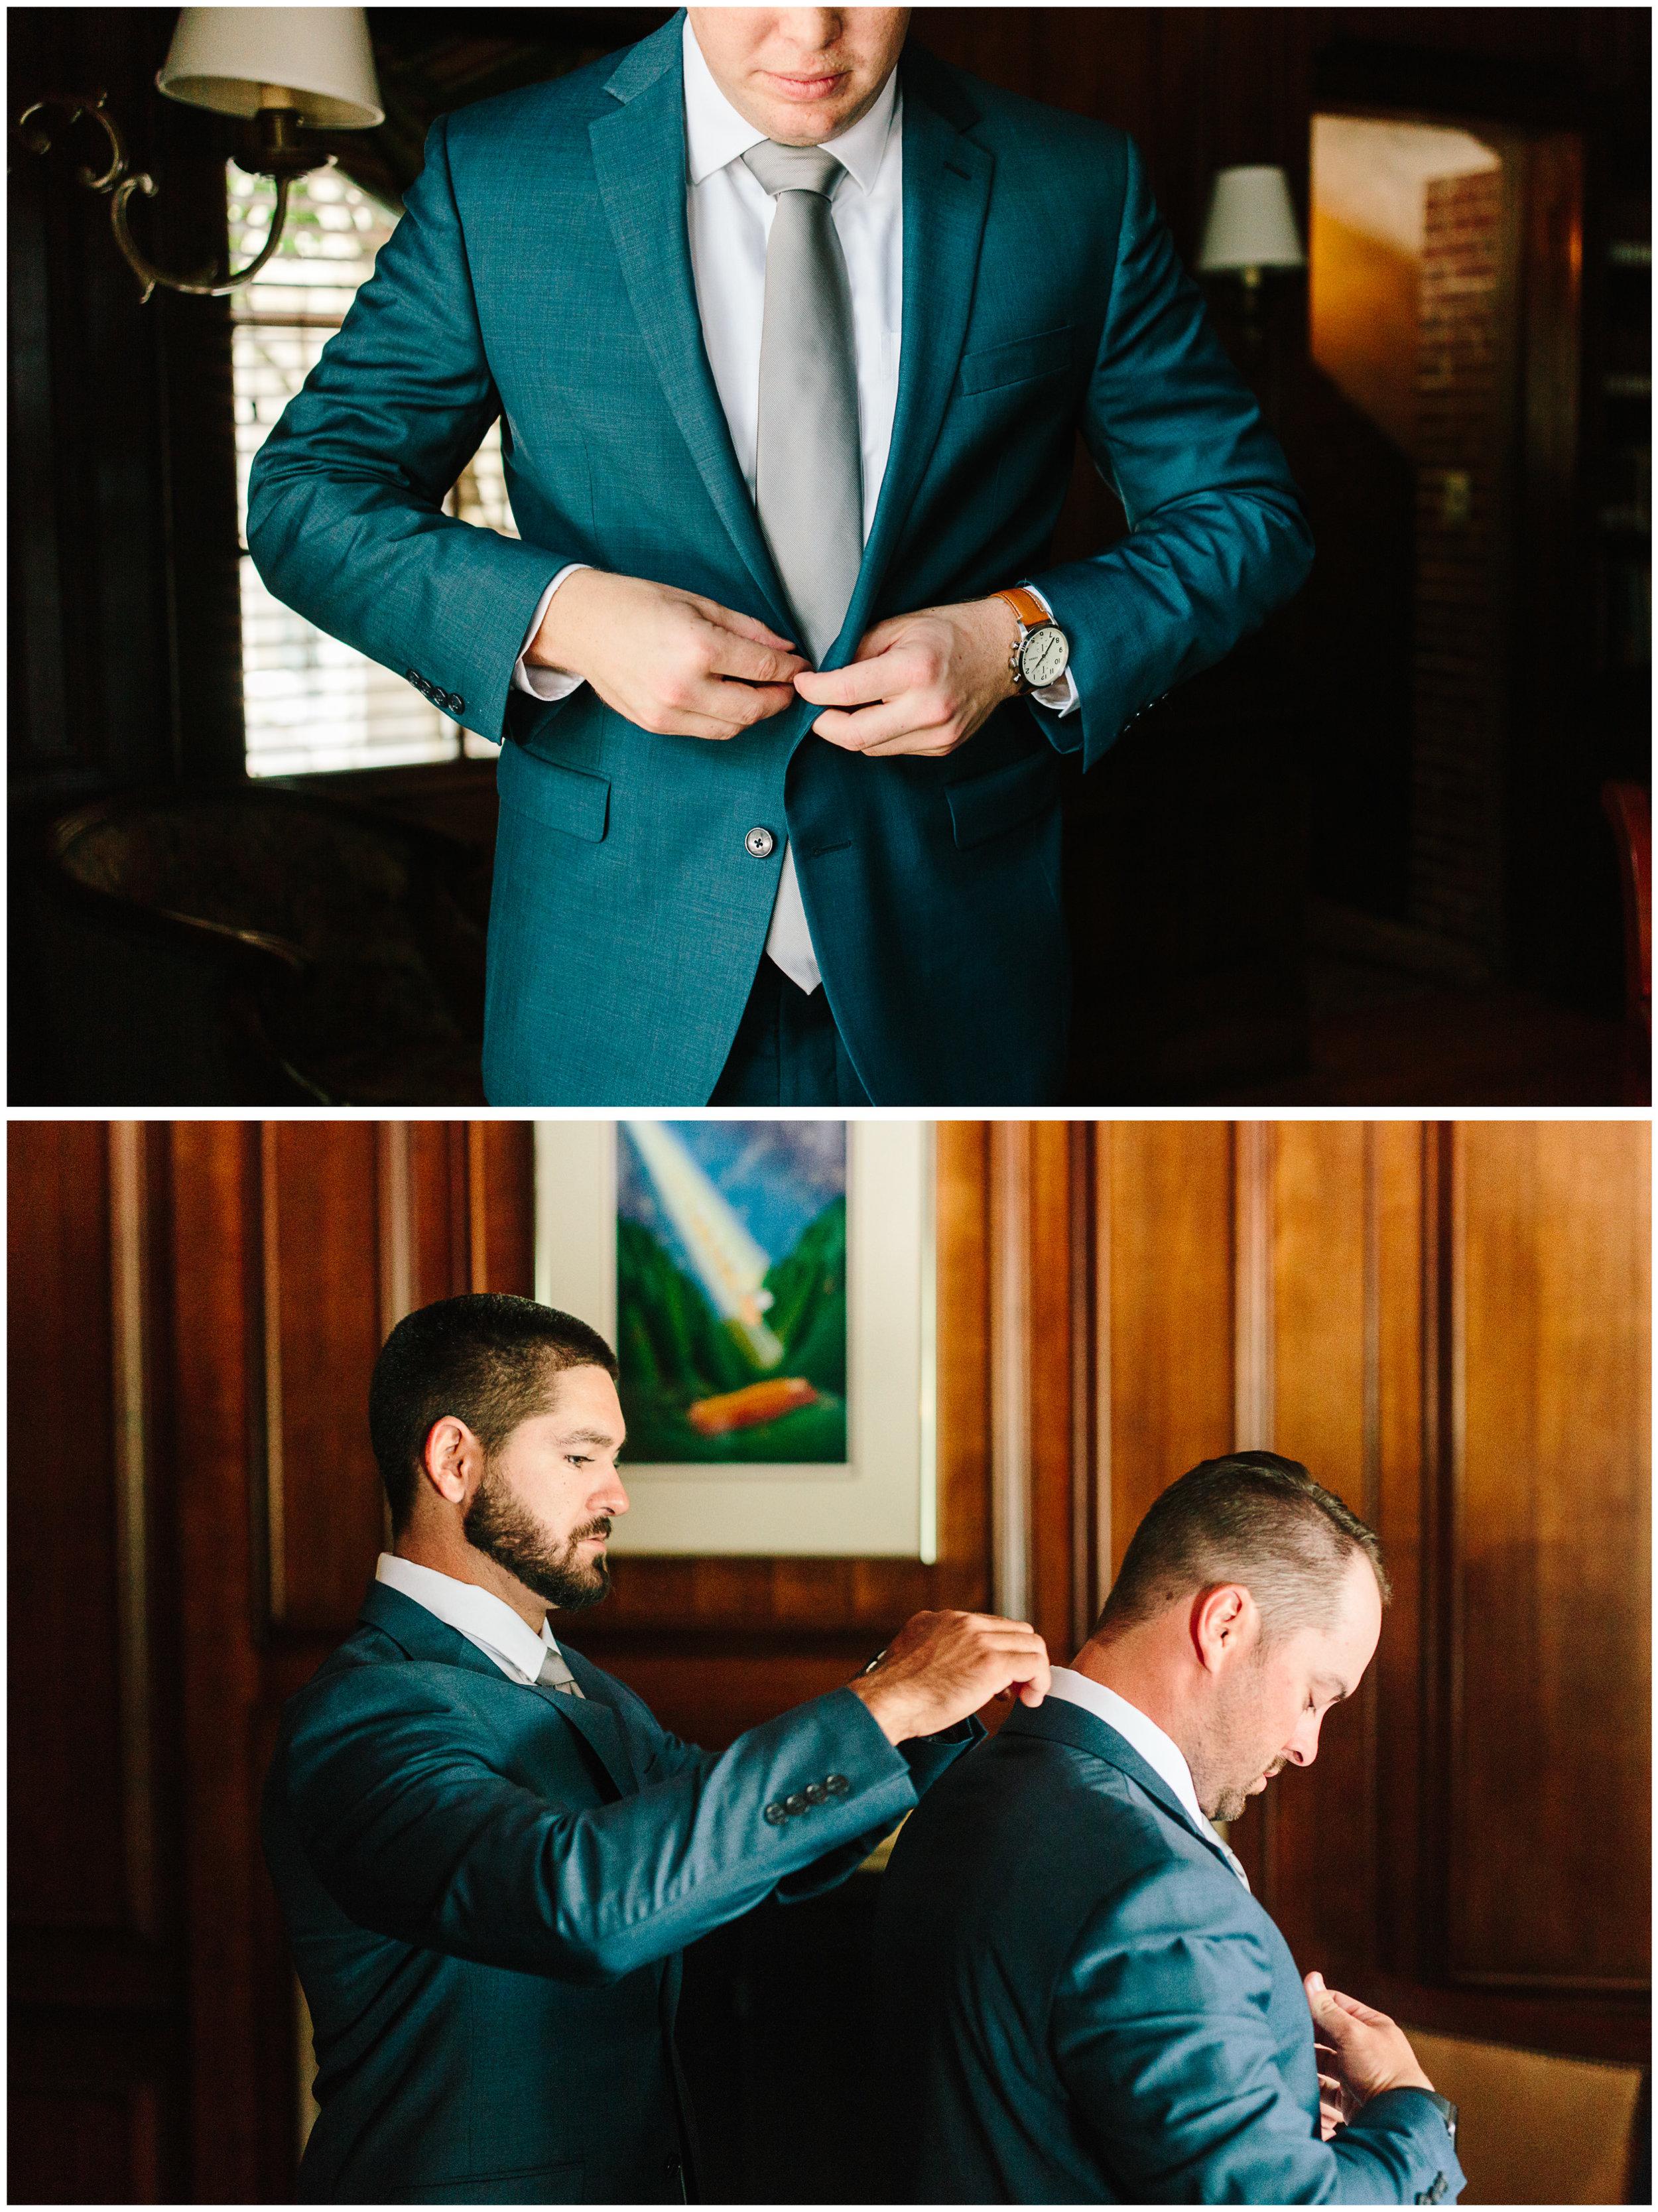 ann_arbor_michigan_wedding_26.jpg